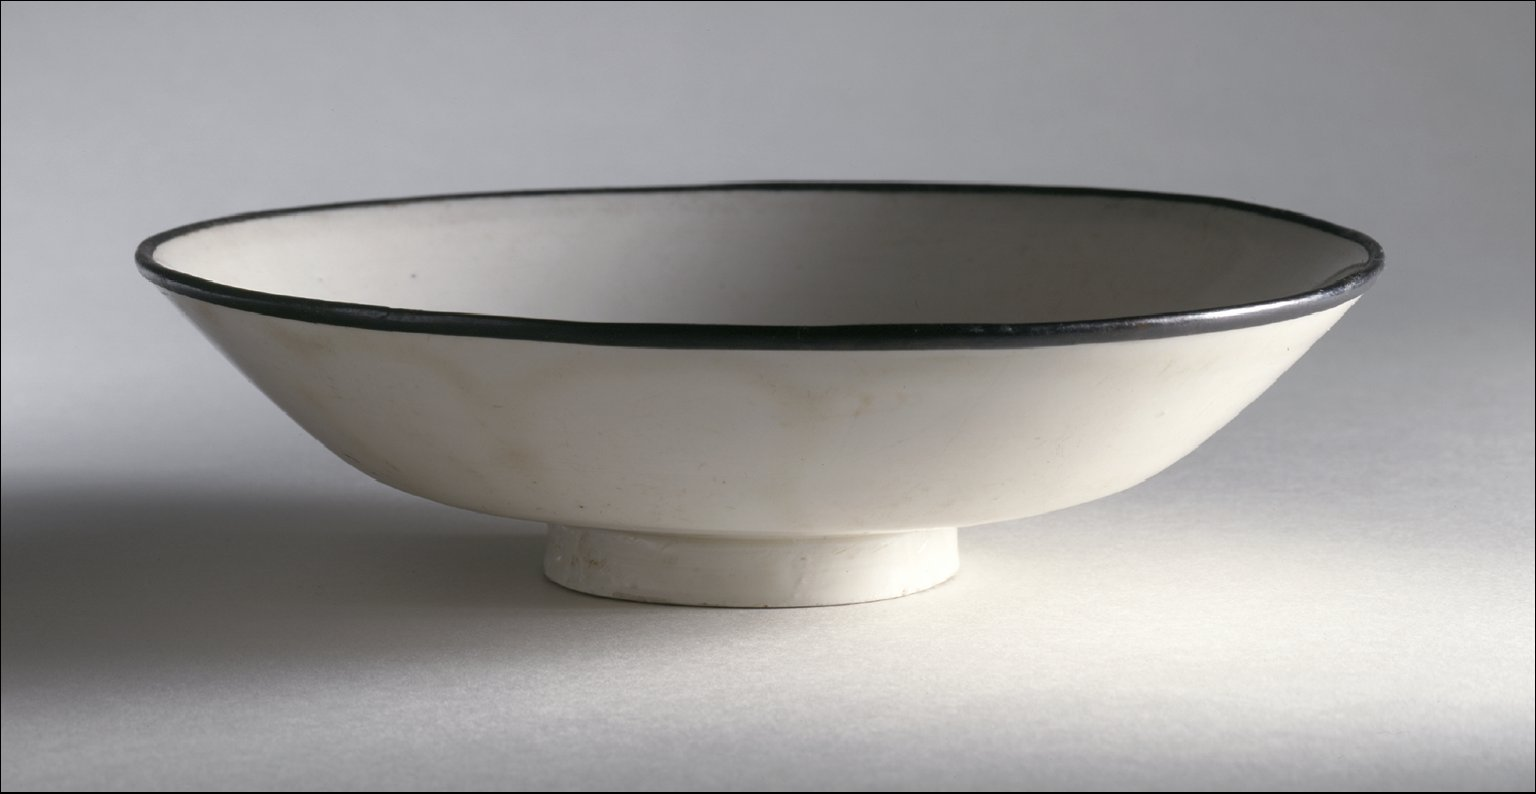 Dish (Pan)